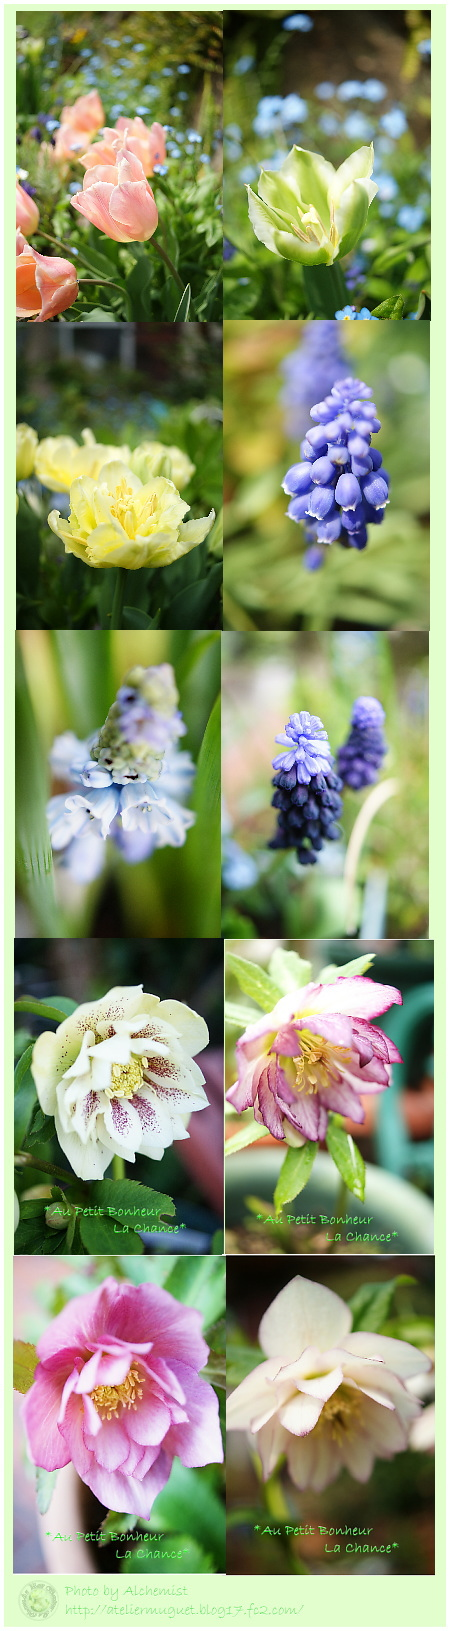 g4-gardenf.jpg